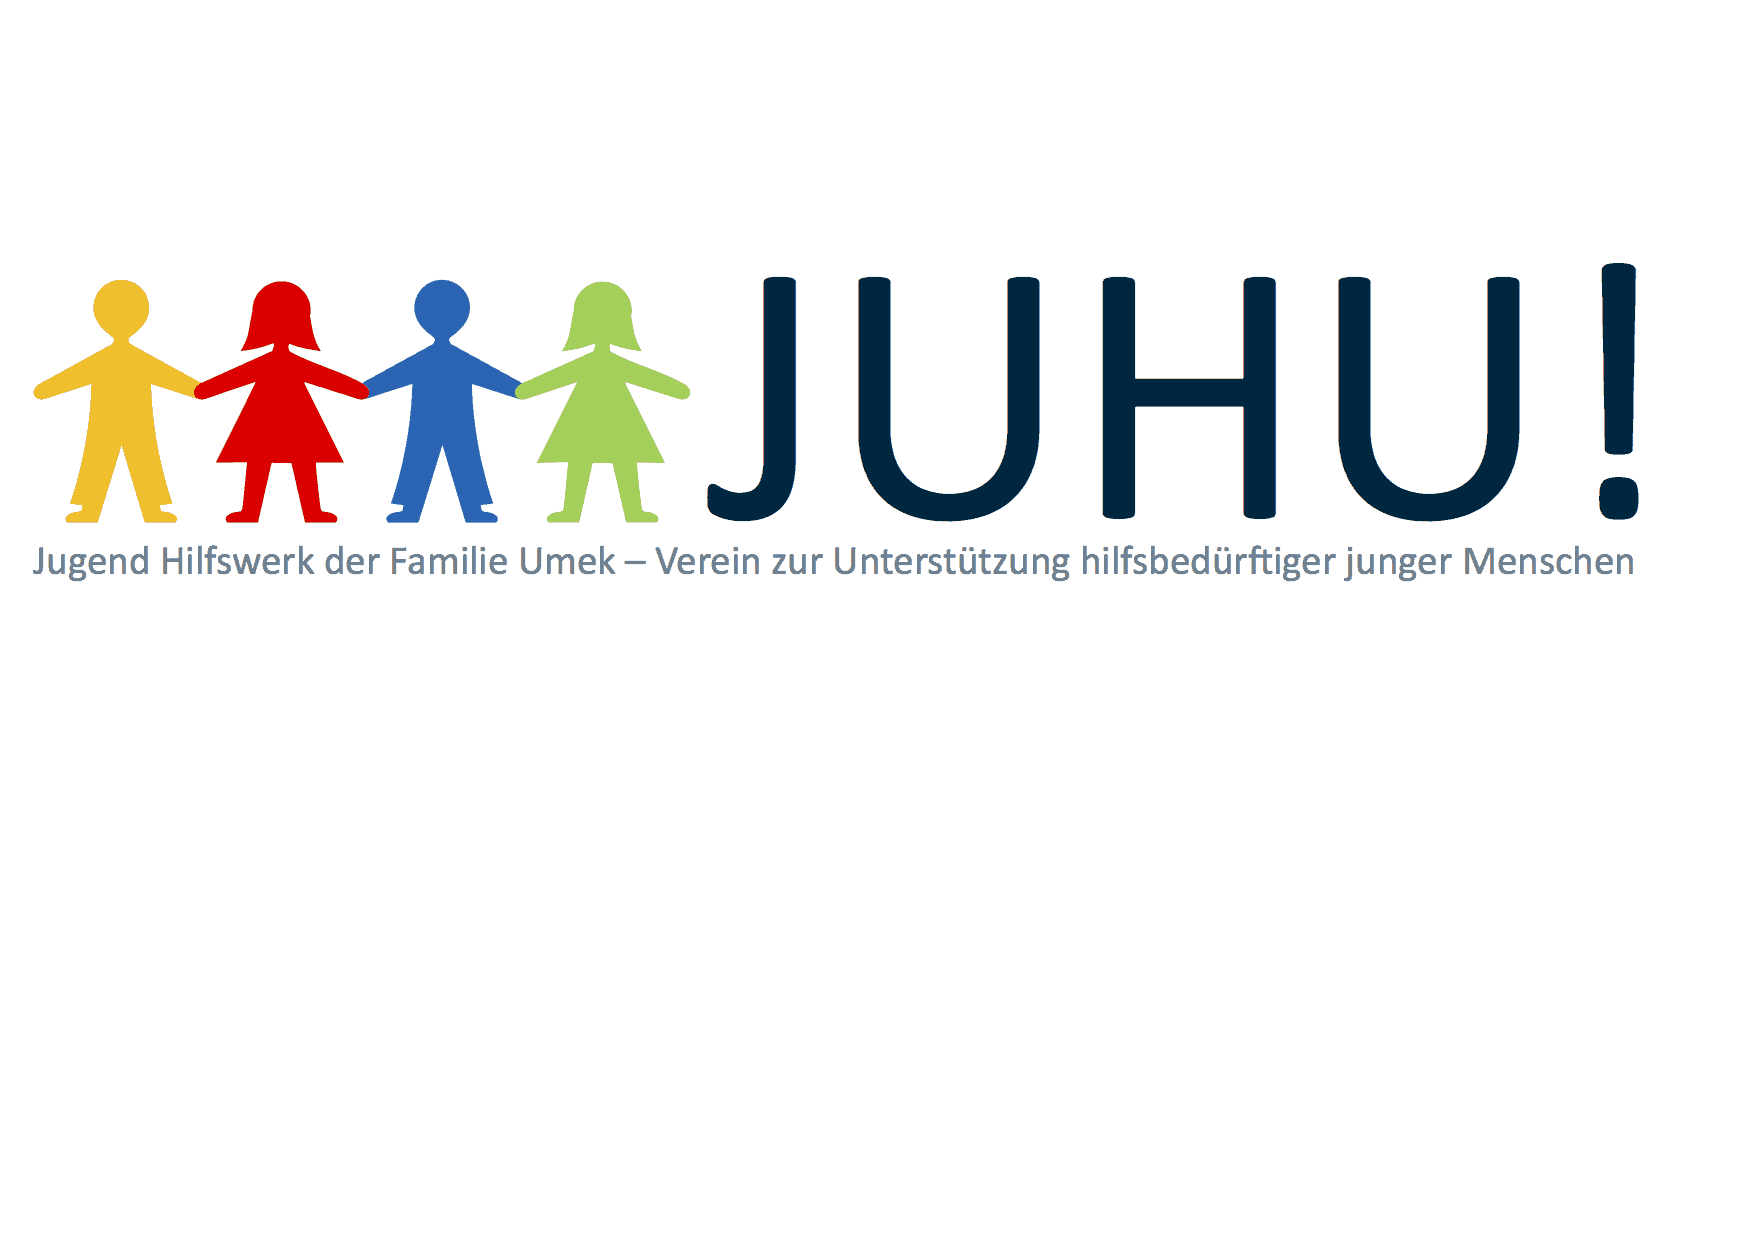 JUHU! Jugend Hilfswerk der Familie Umek